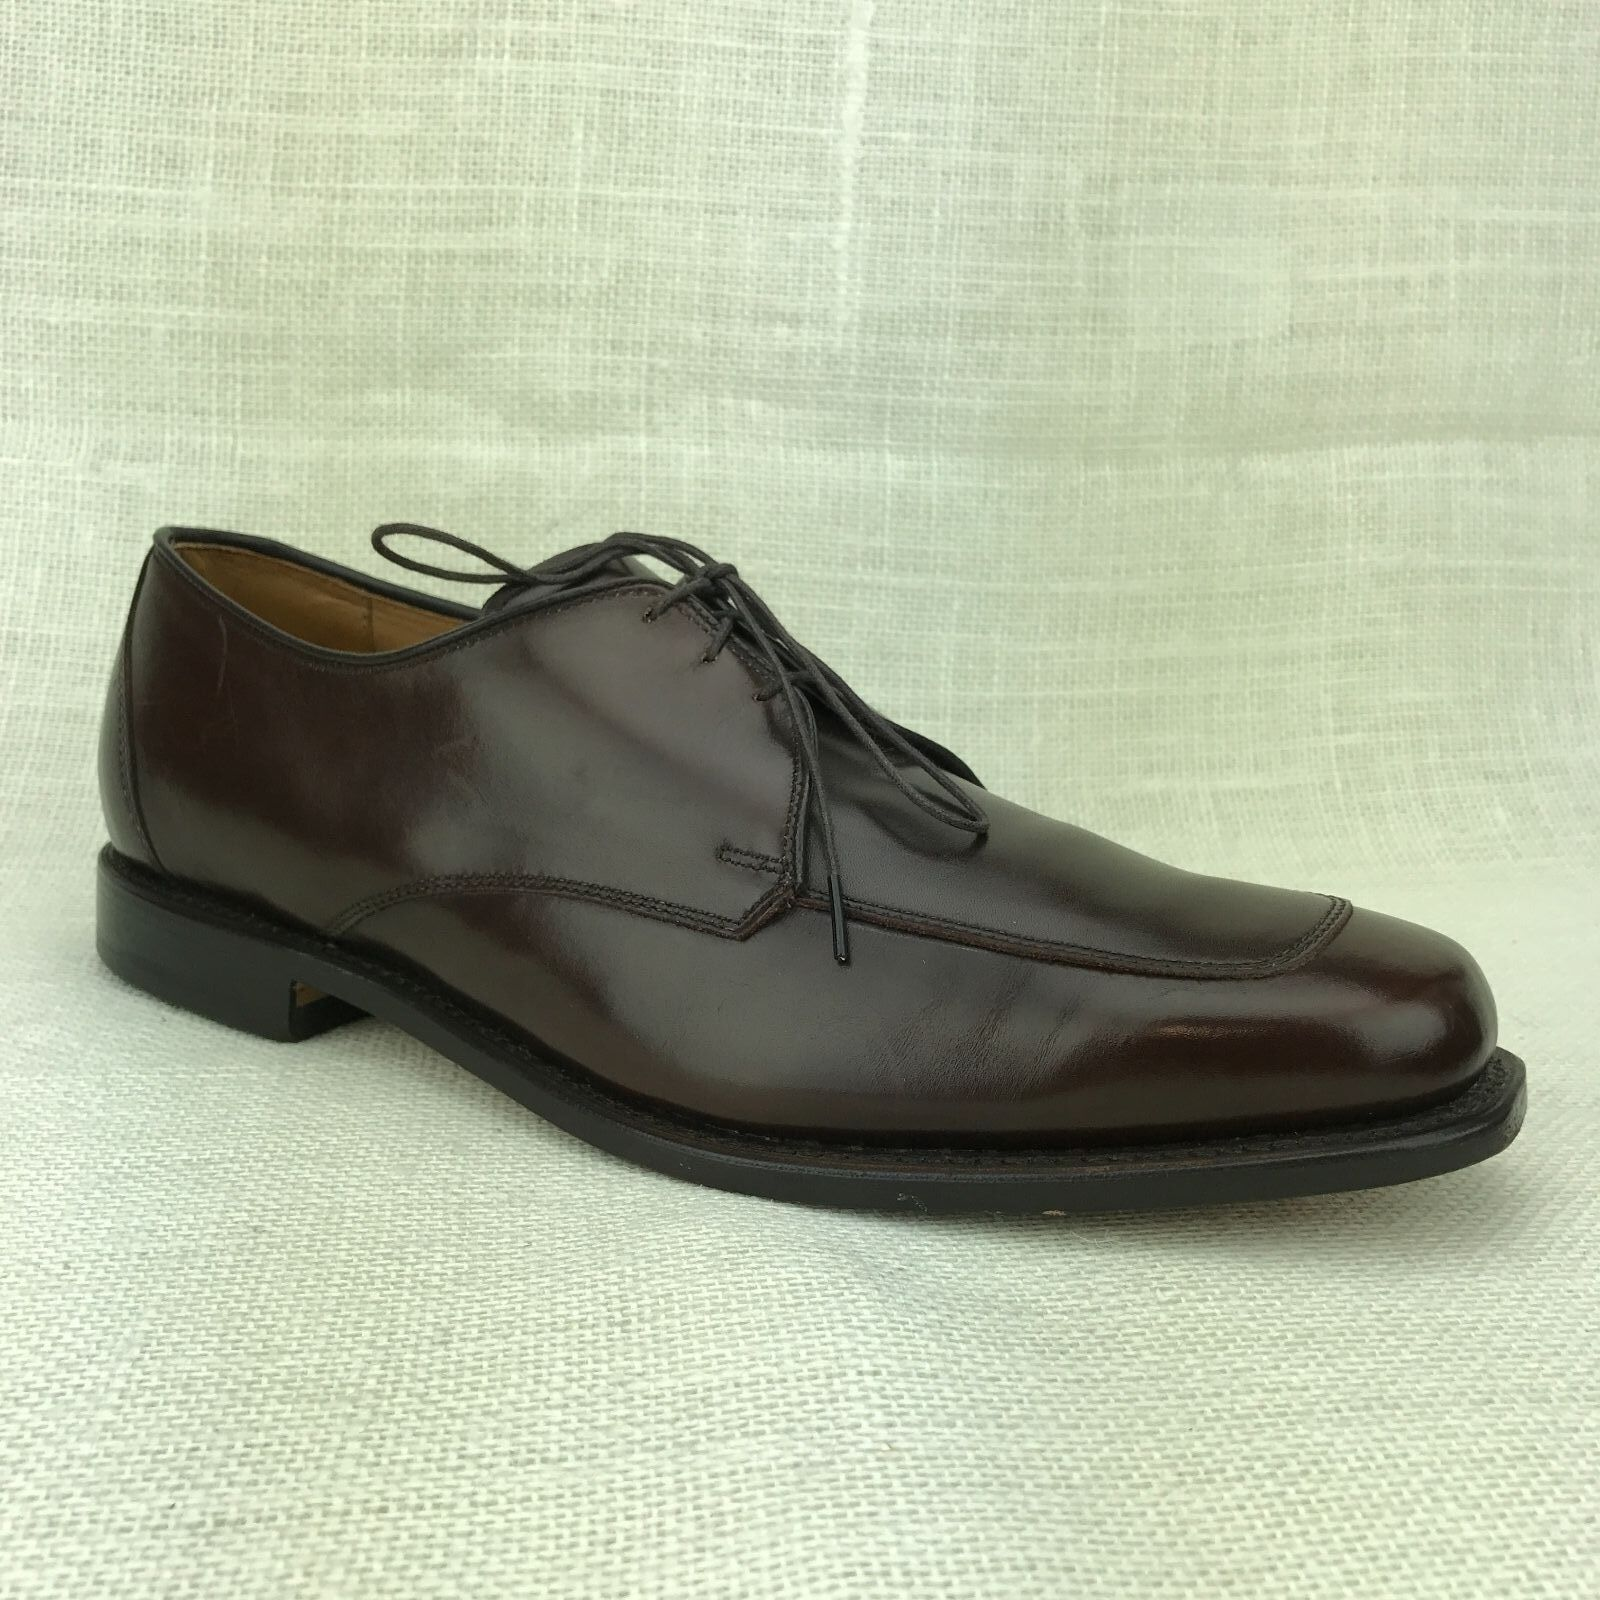 MINT Allen Edmonds Burton US 10.5 D Dark Brown Leather Formal Mens Dress Oxfords